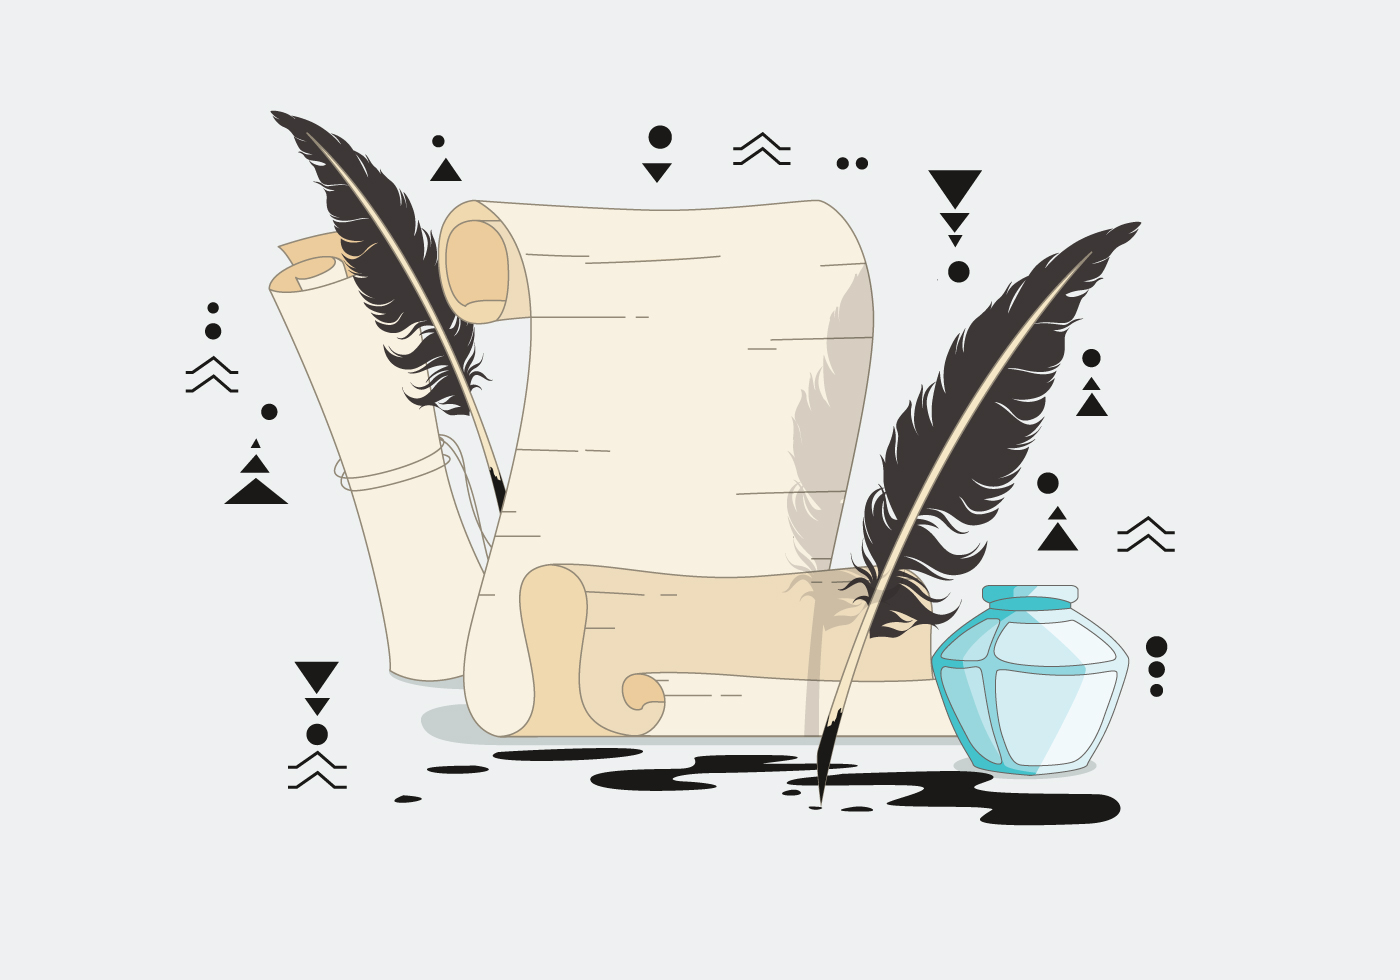 Vector illustration credit: www.vecteezy.com